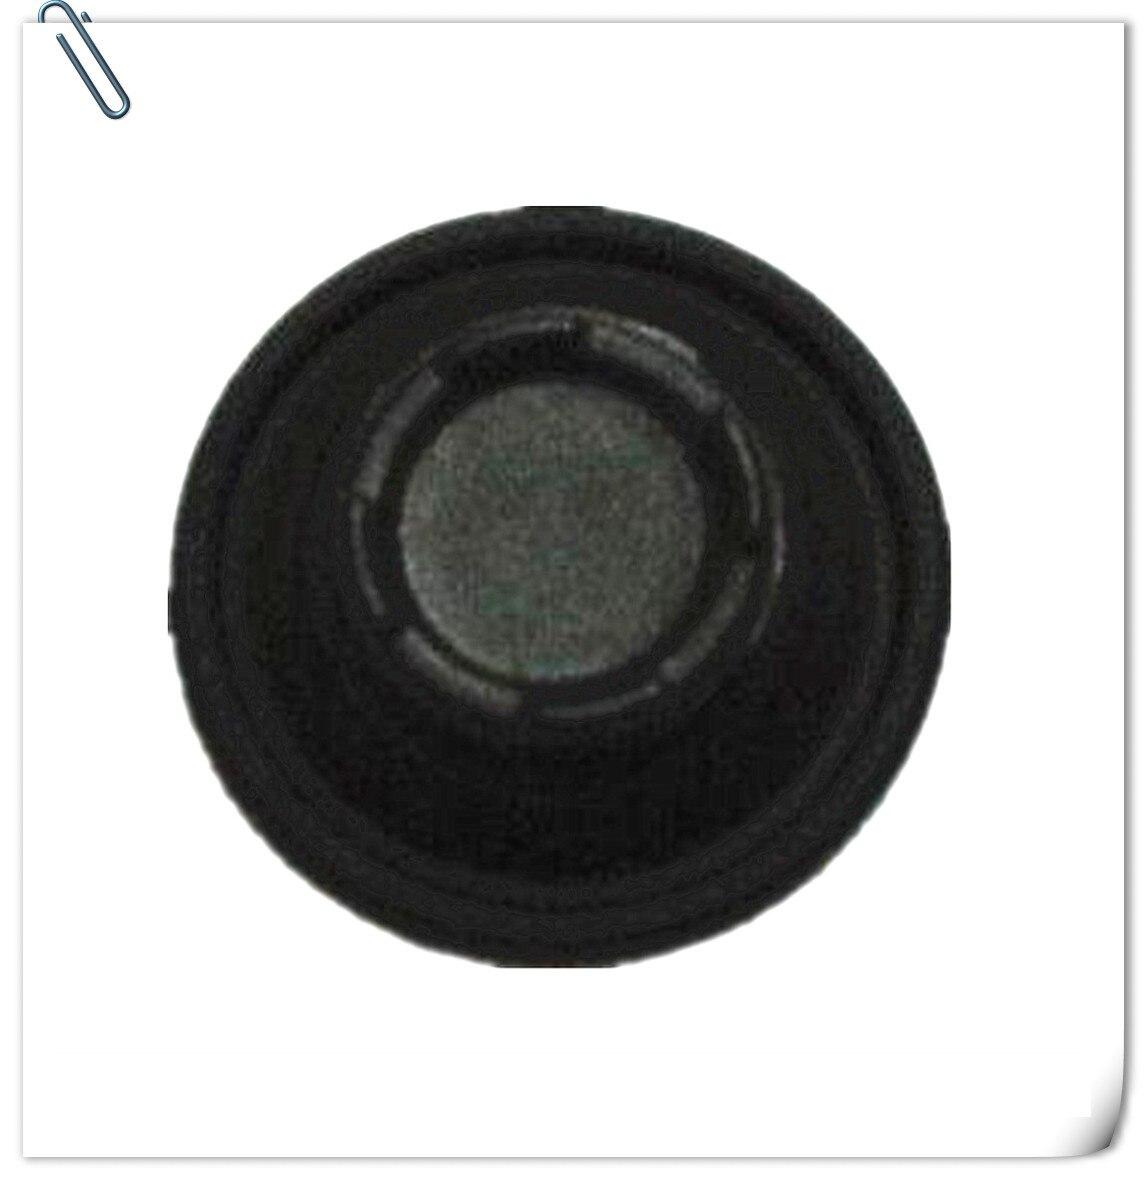 Multi-Controller Button Joystick Buttons Repair Parts For Canon EOS 5D Mark III